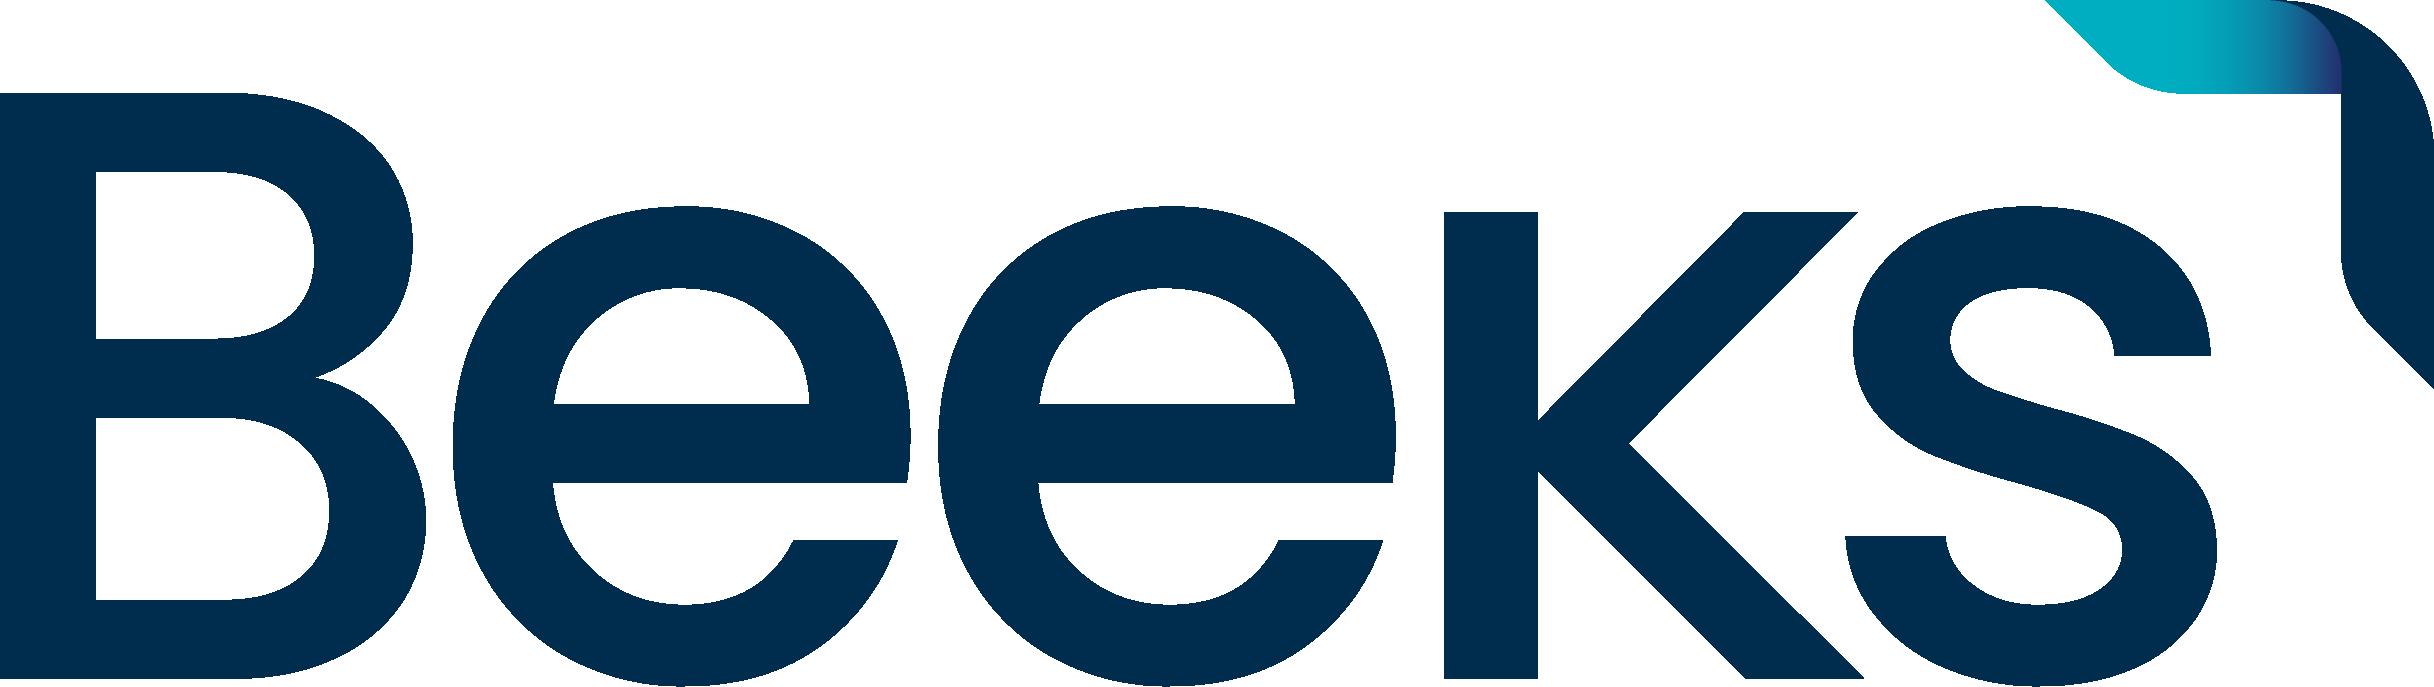 Beeks Financial Cloud Group Plc